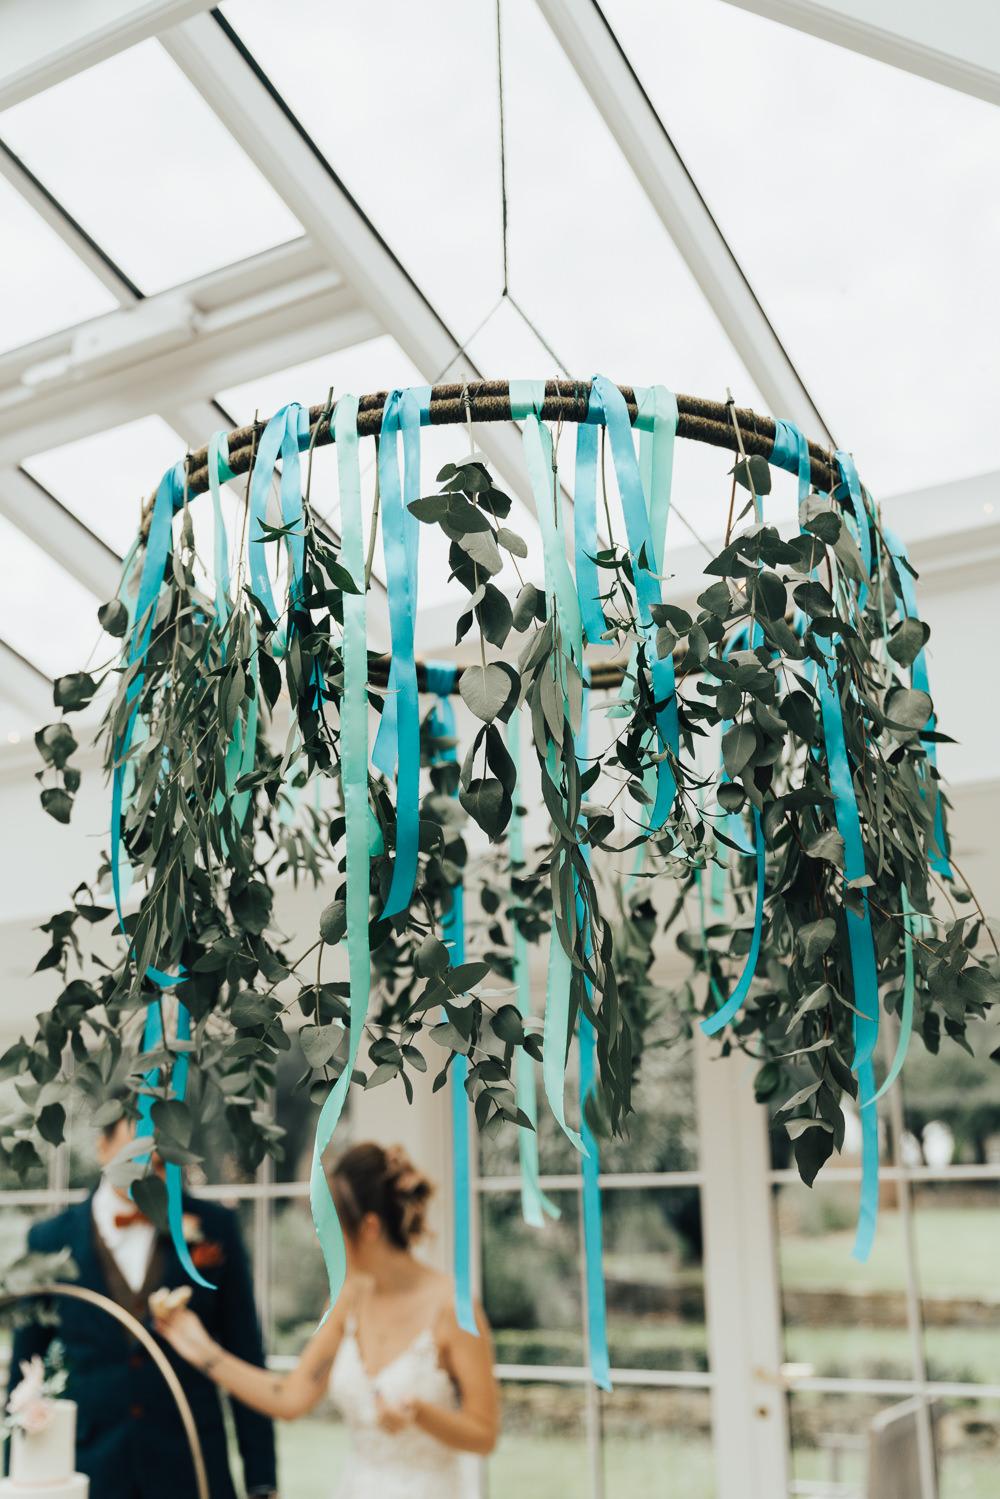 Hanging Flowers Suspended Ribbon Greenery Foliage Hoop Wedding Ideas Rebecca Carpenter Photography